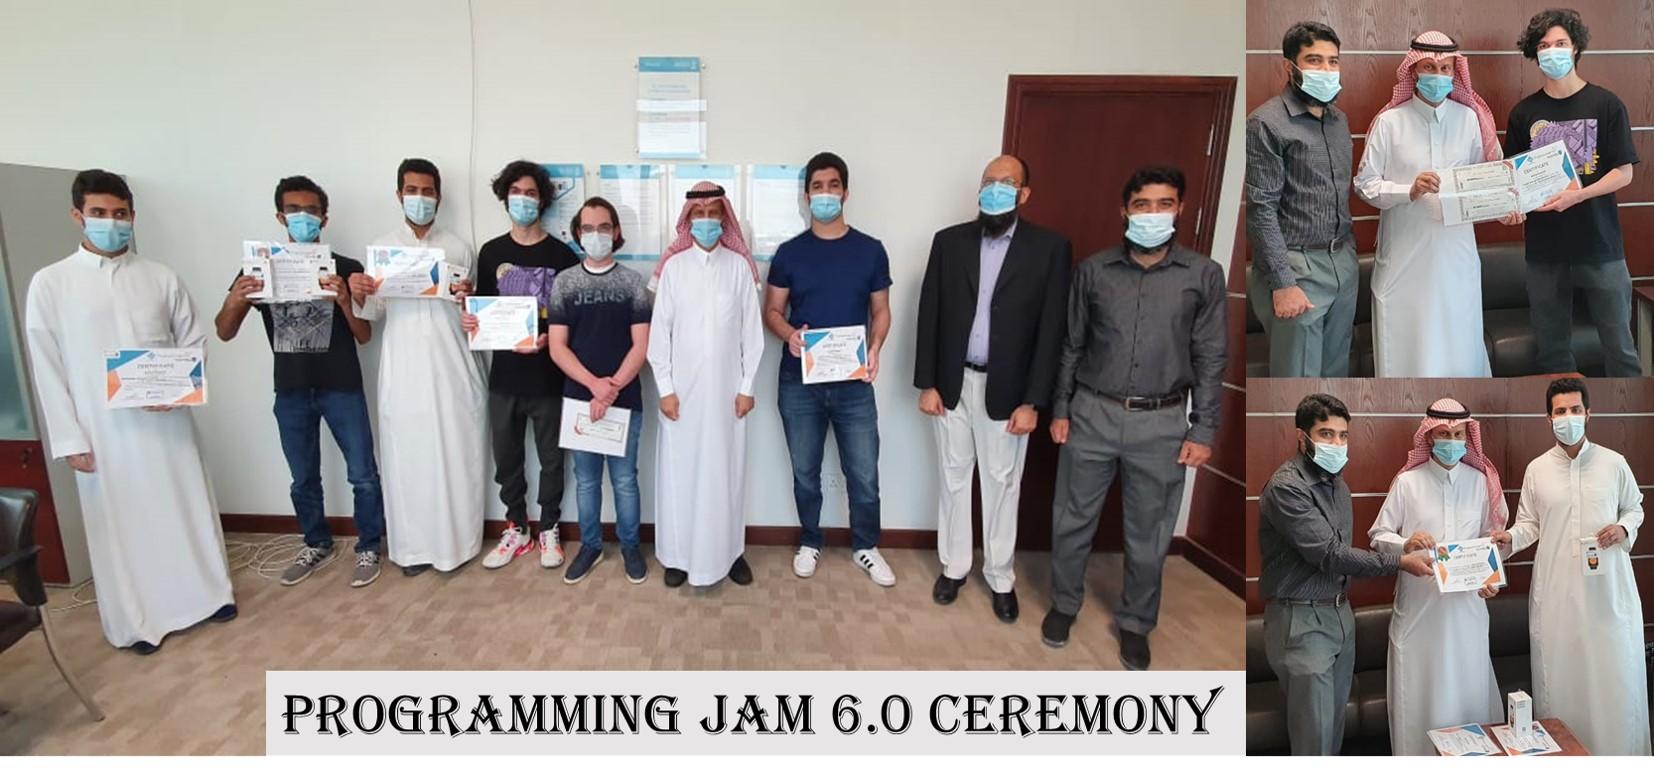 Programming Jam Ceremony 6.0